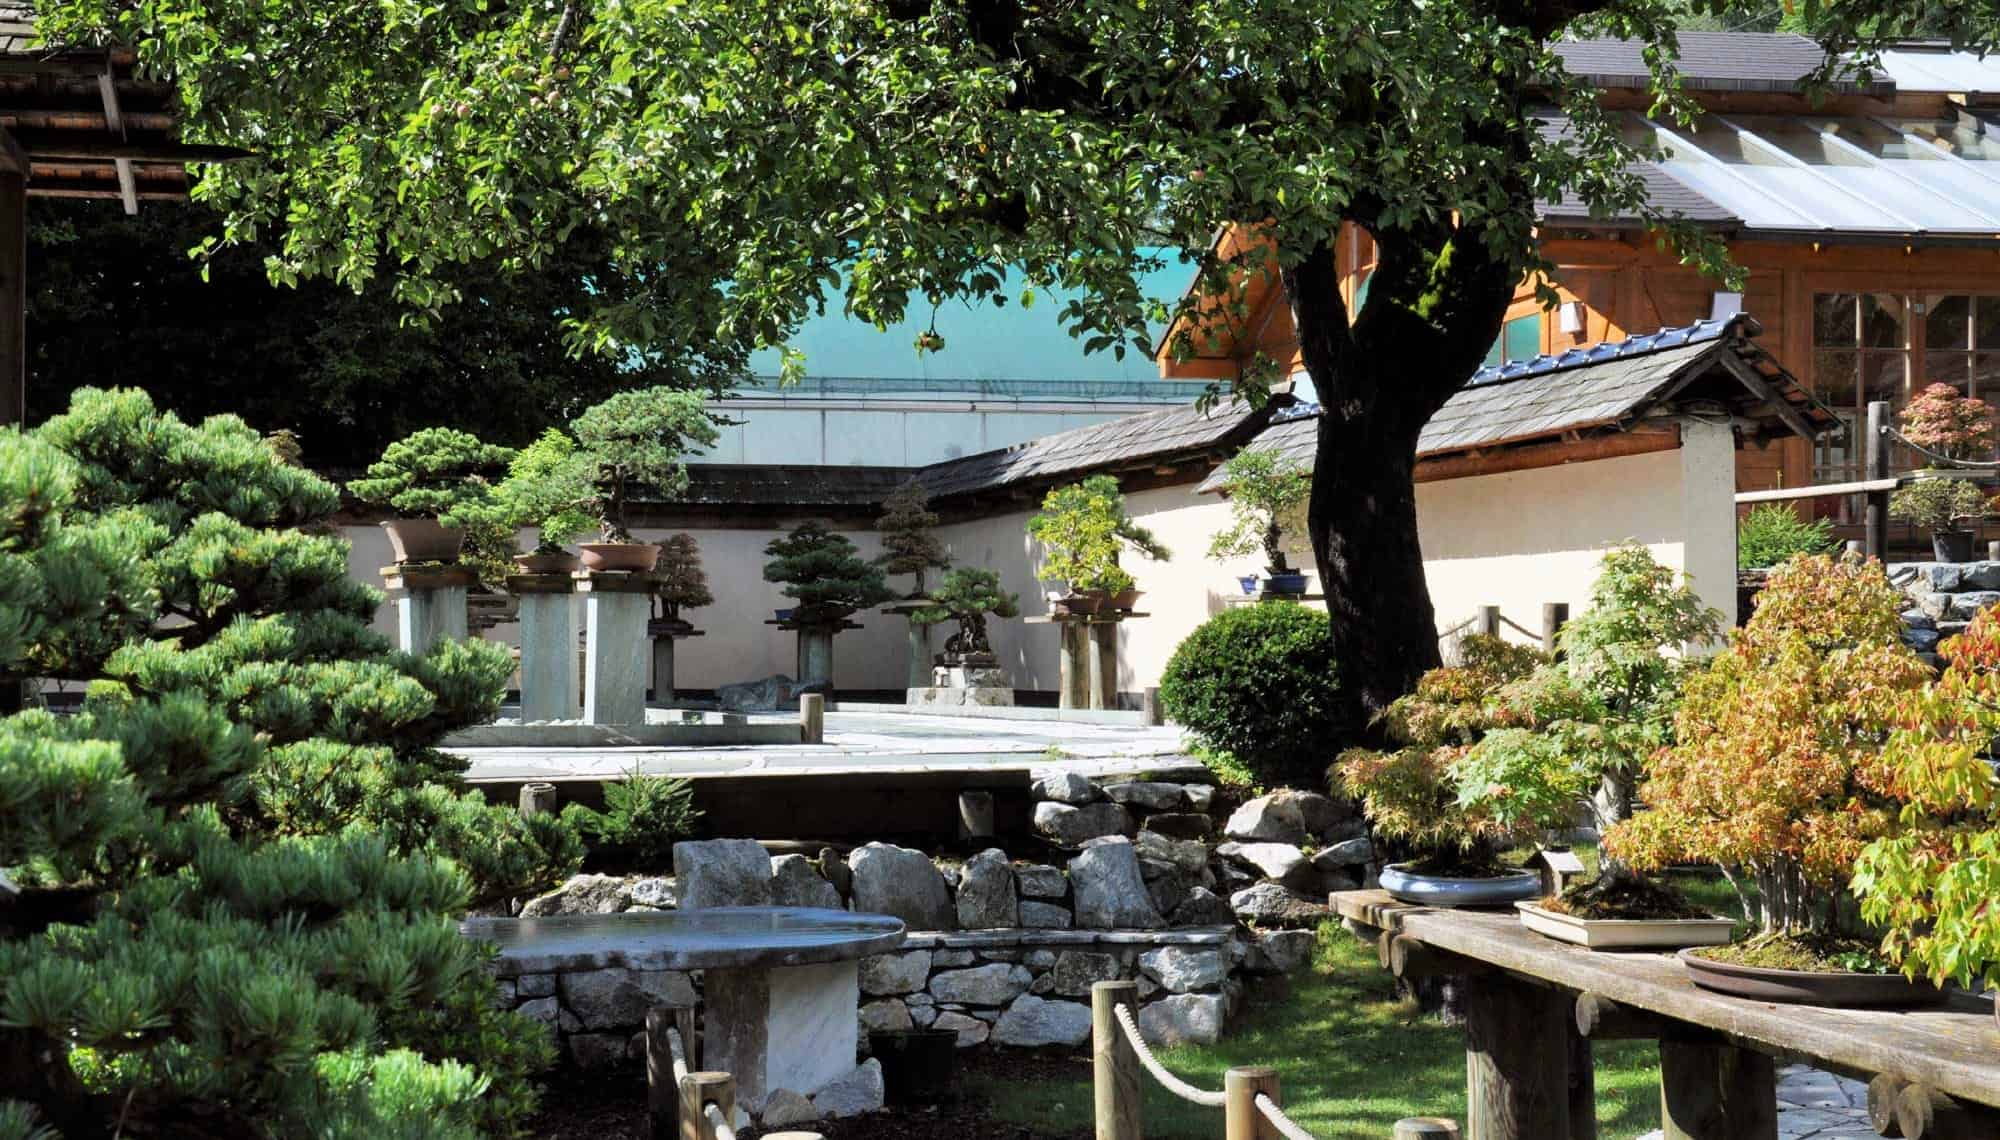 Ausflug ins Bonsaimuseum in Seeboden am Millstätter See